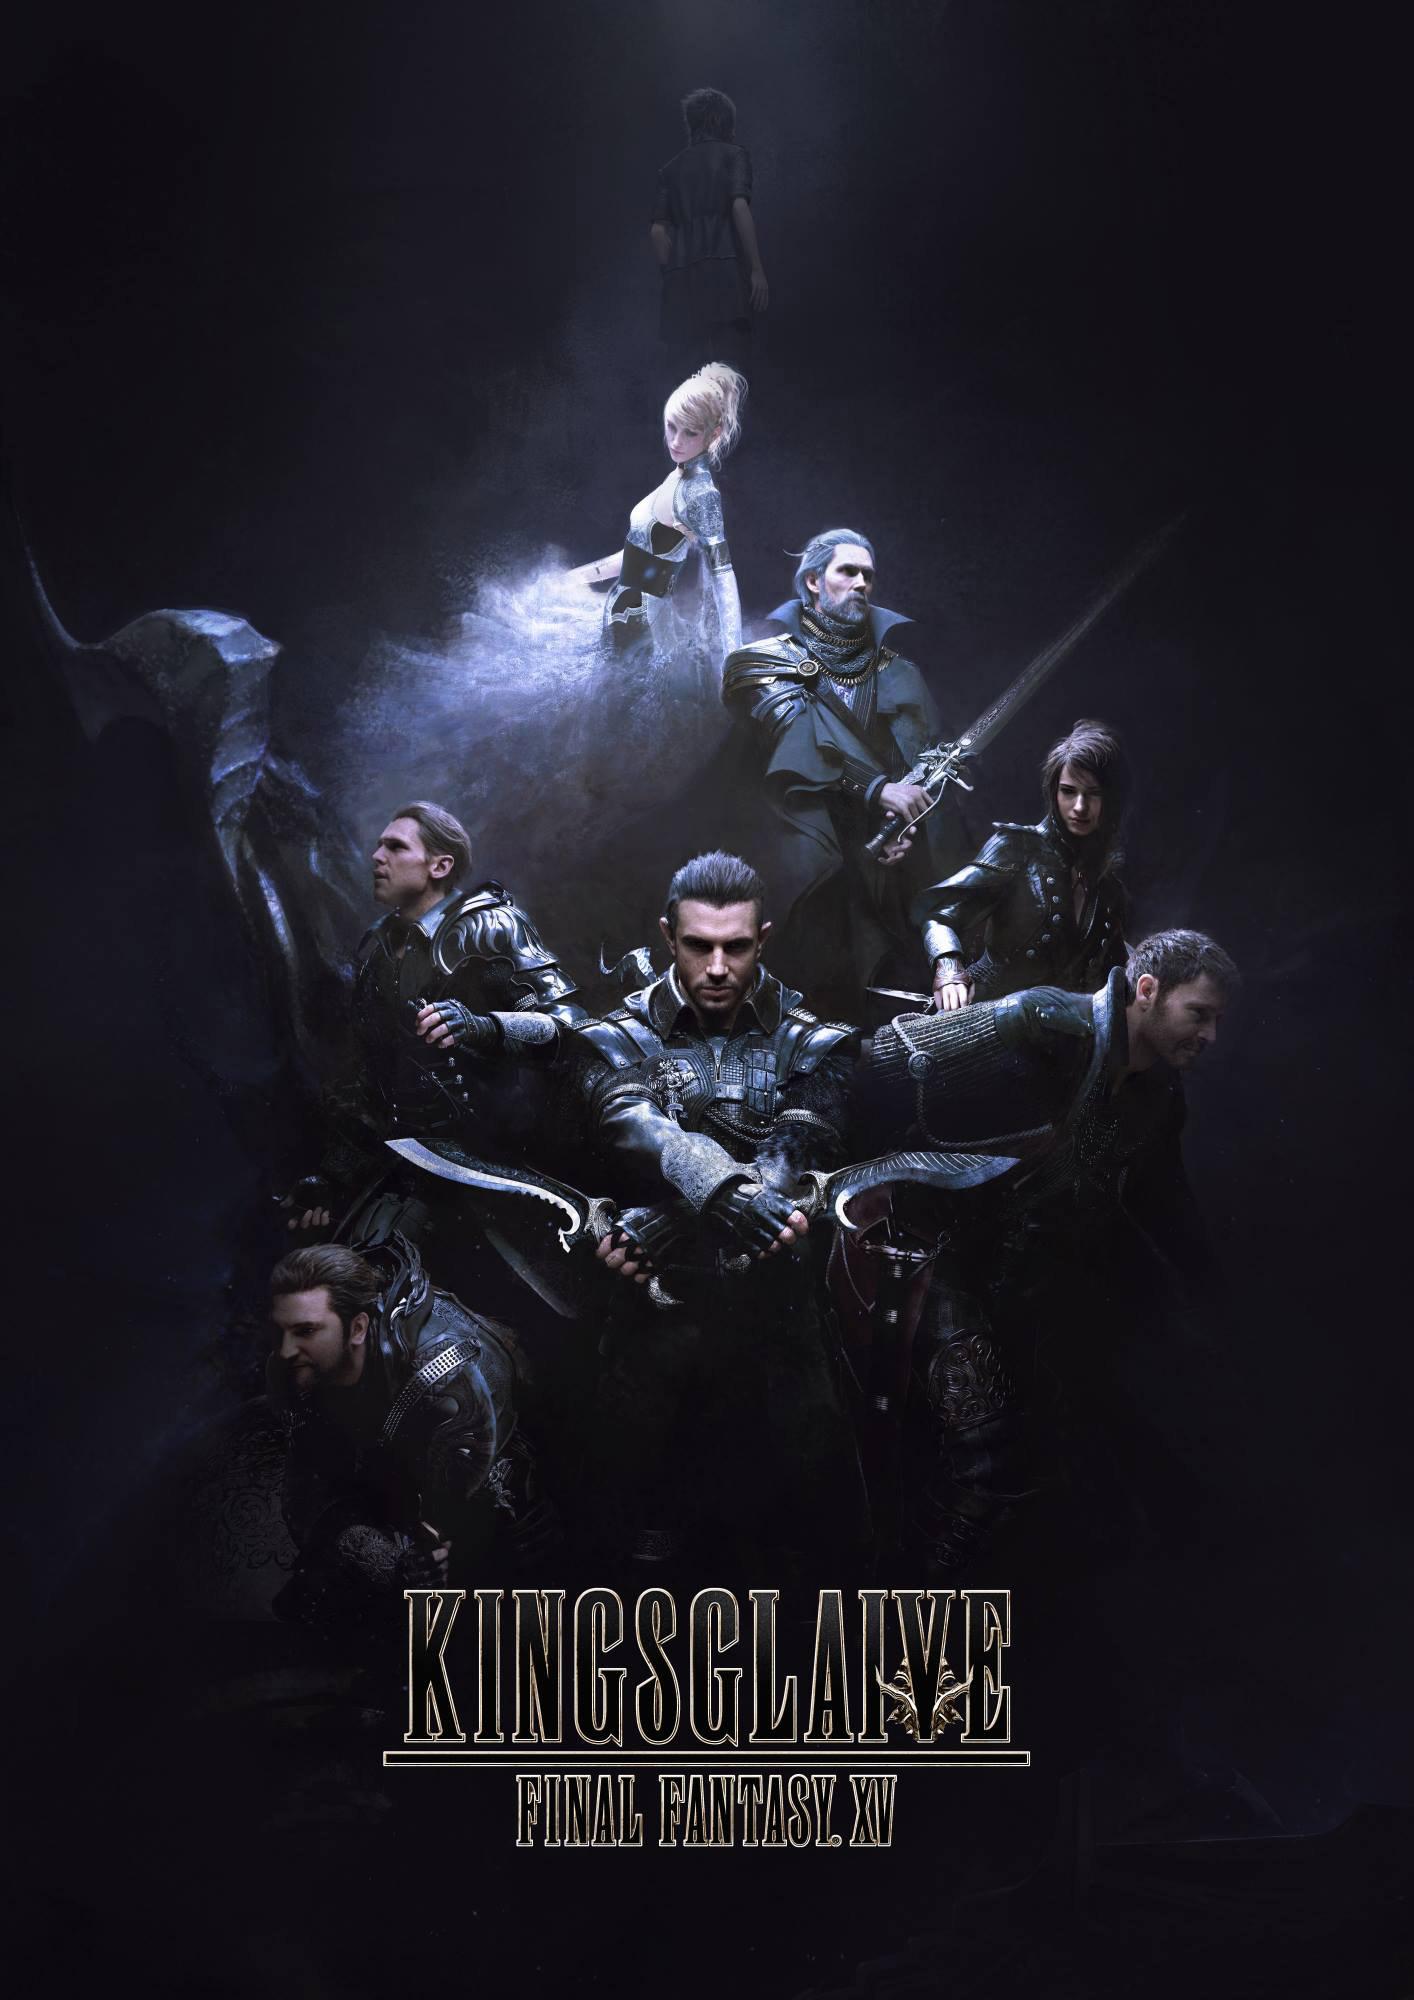 kingsglaive-final-fantasy-xv-poster